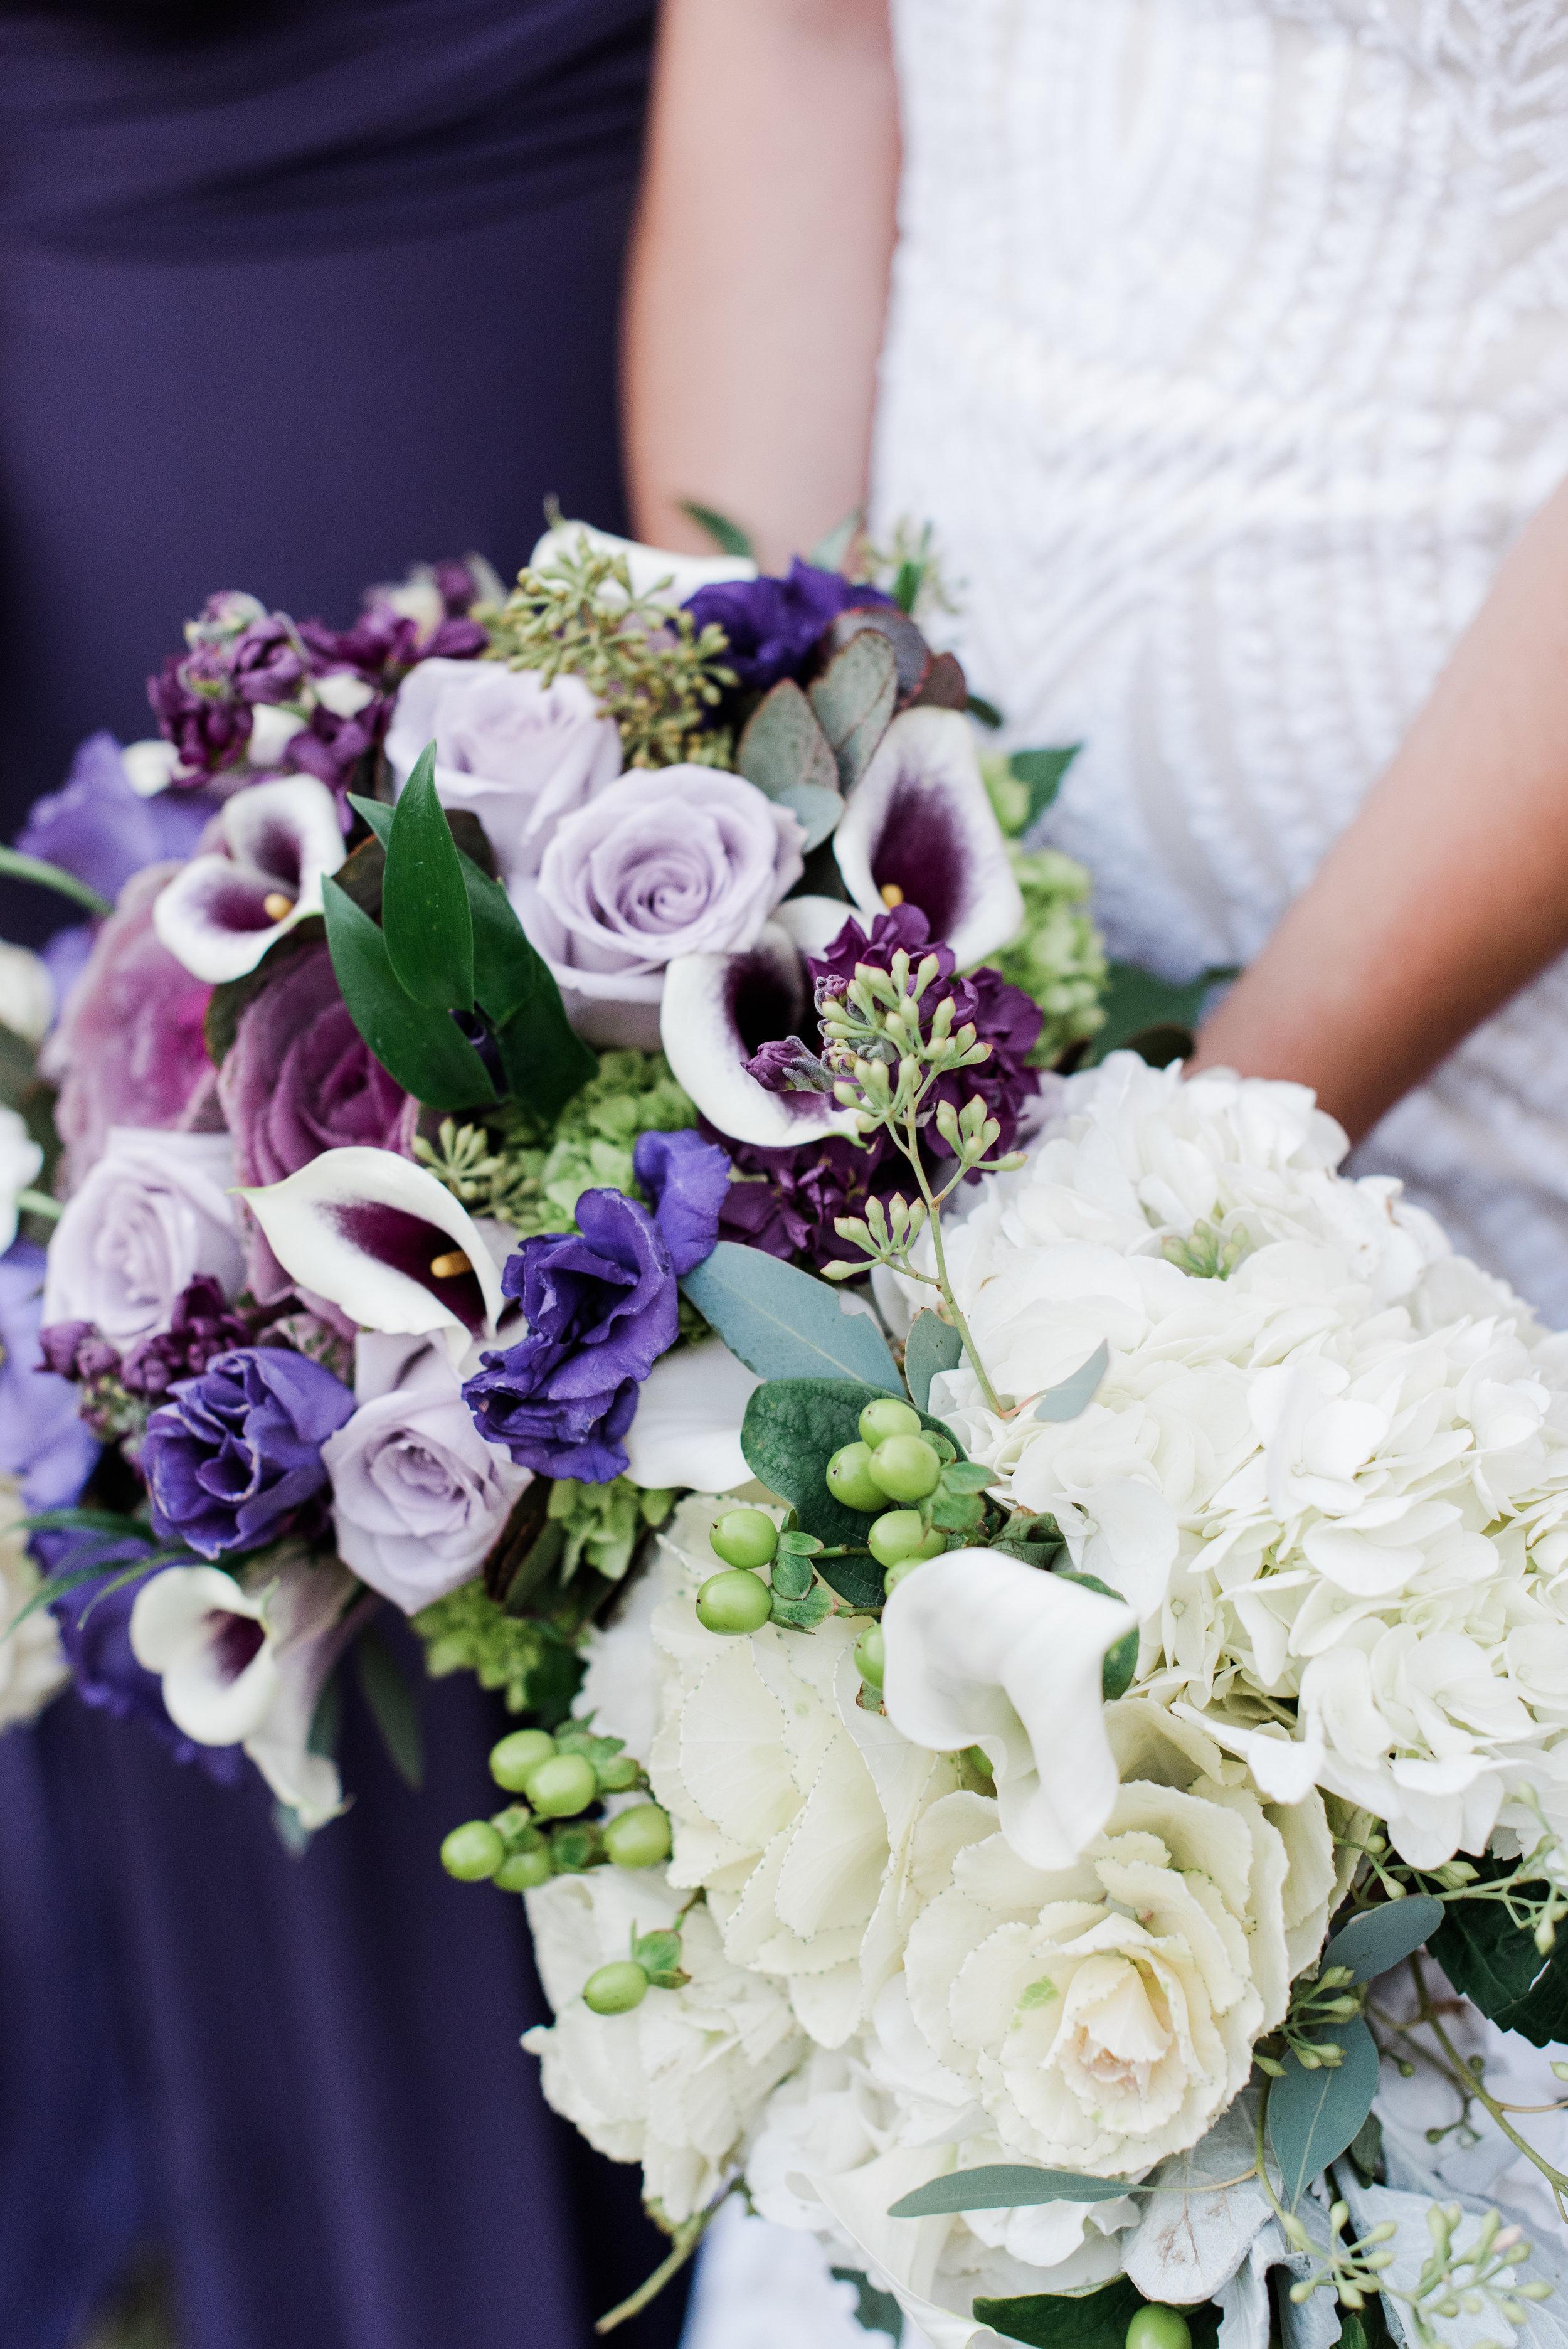 DavidAmandaMundy-Wedding-10282017-KathrynIvyPhotography-308.jpg